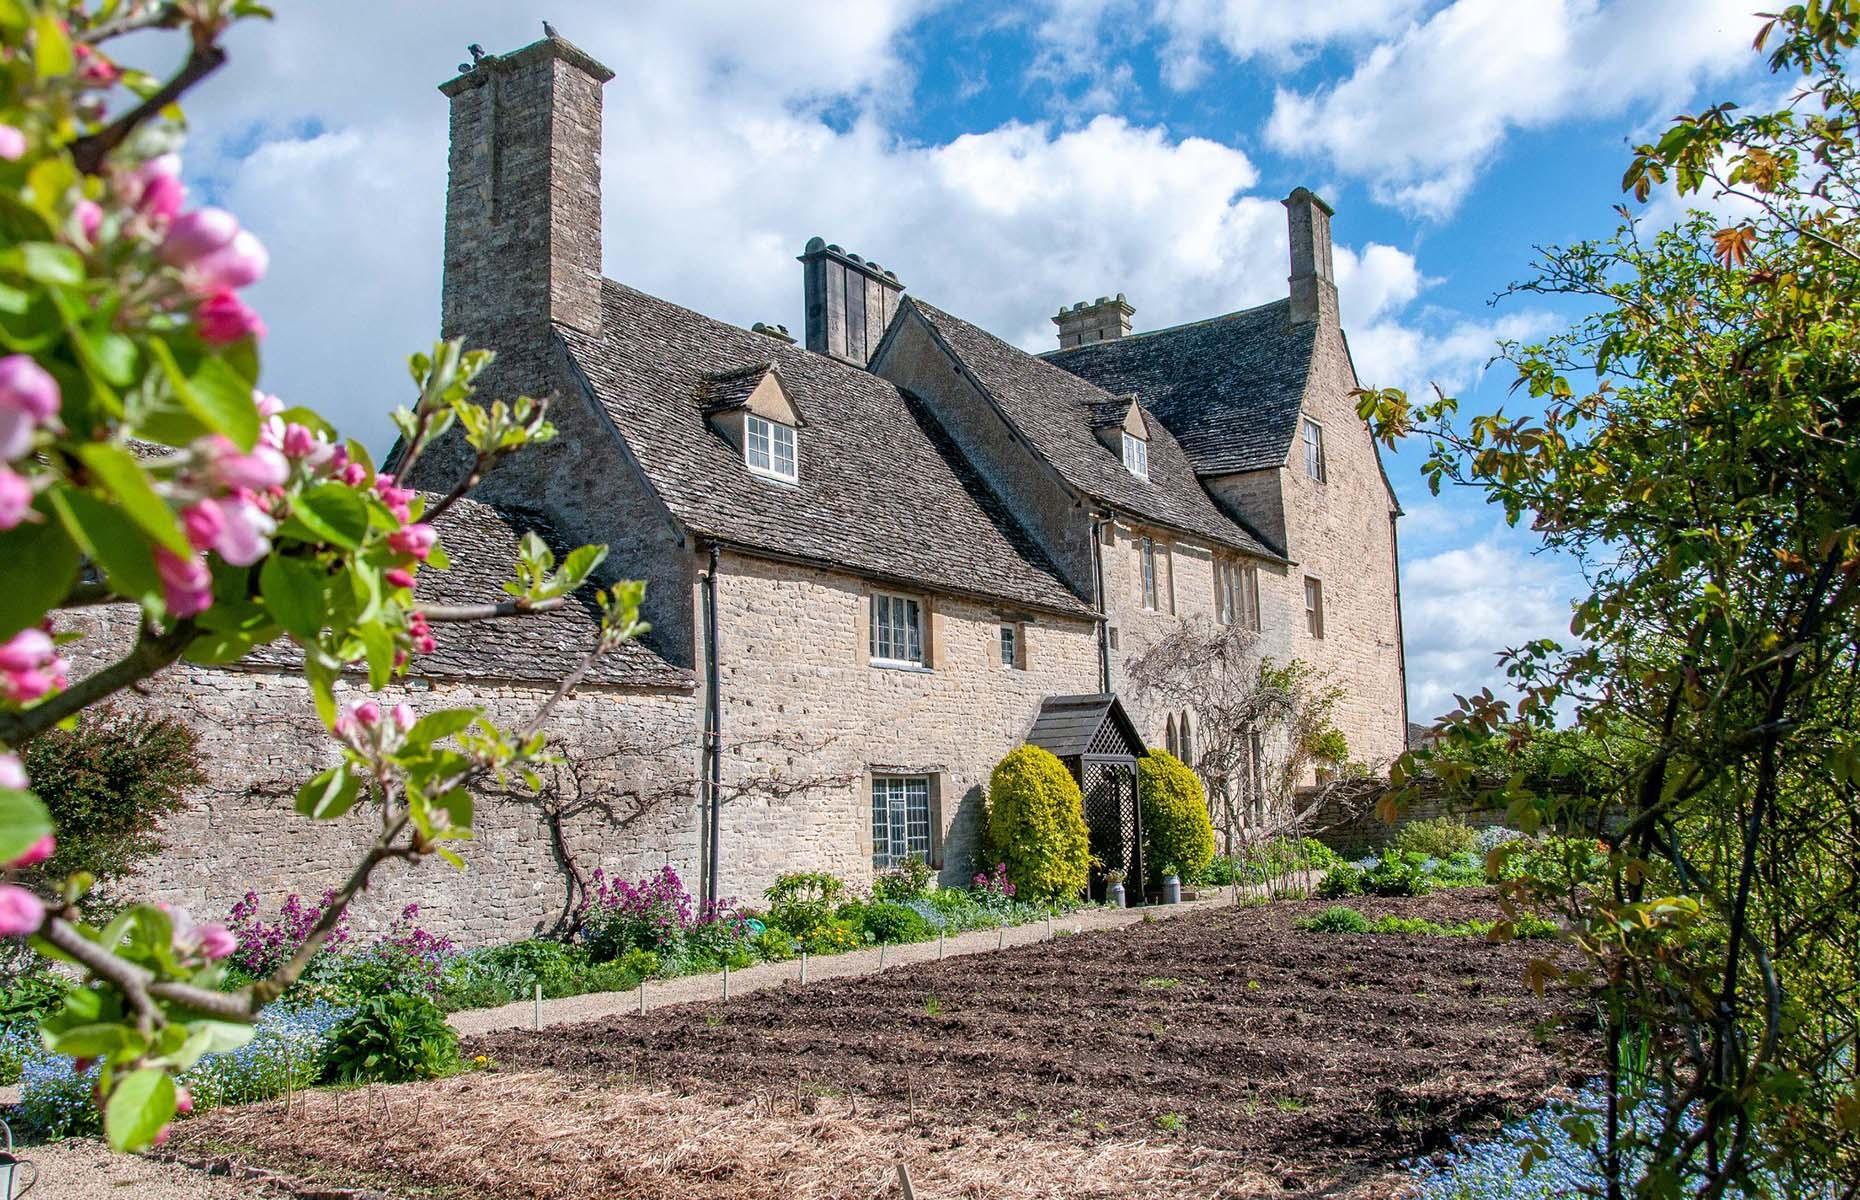 Cogges Manor Farm (Image: Cogges/Facebook)